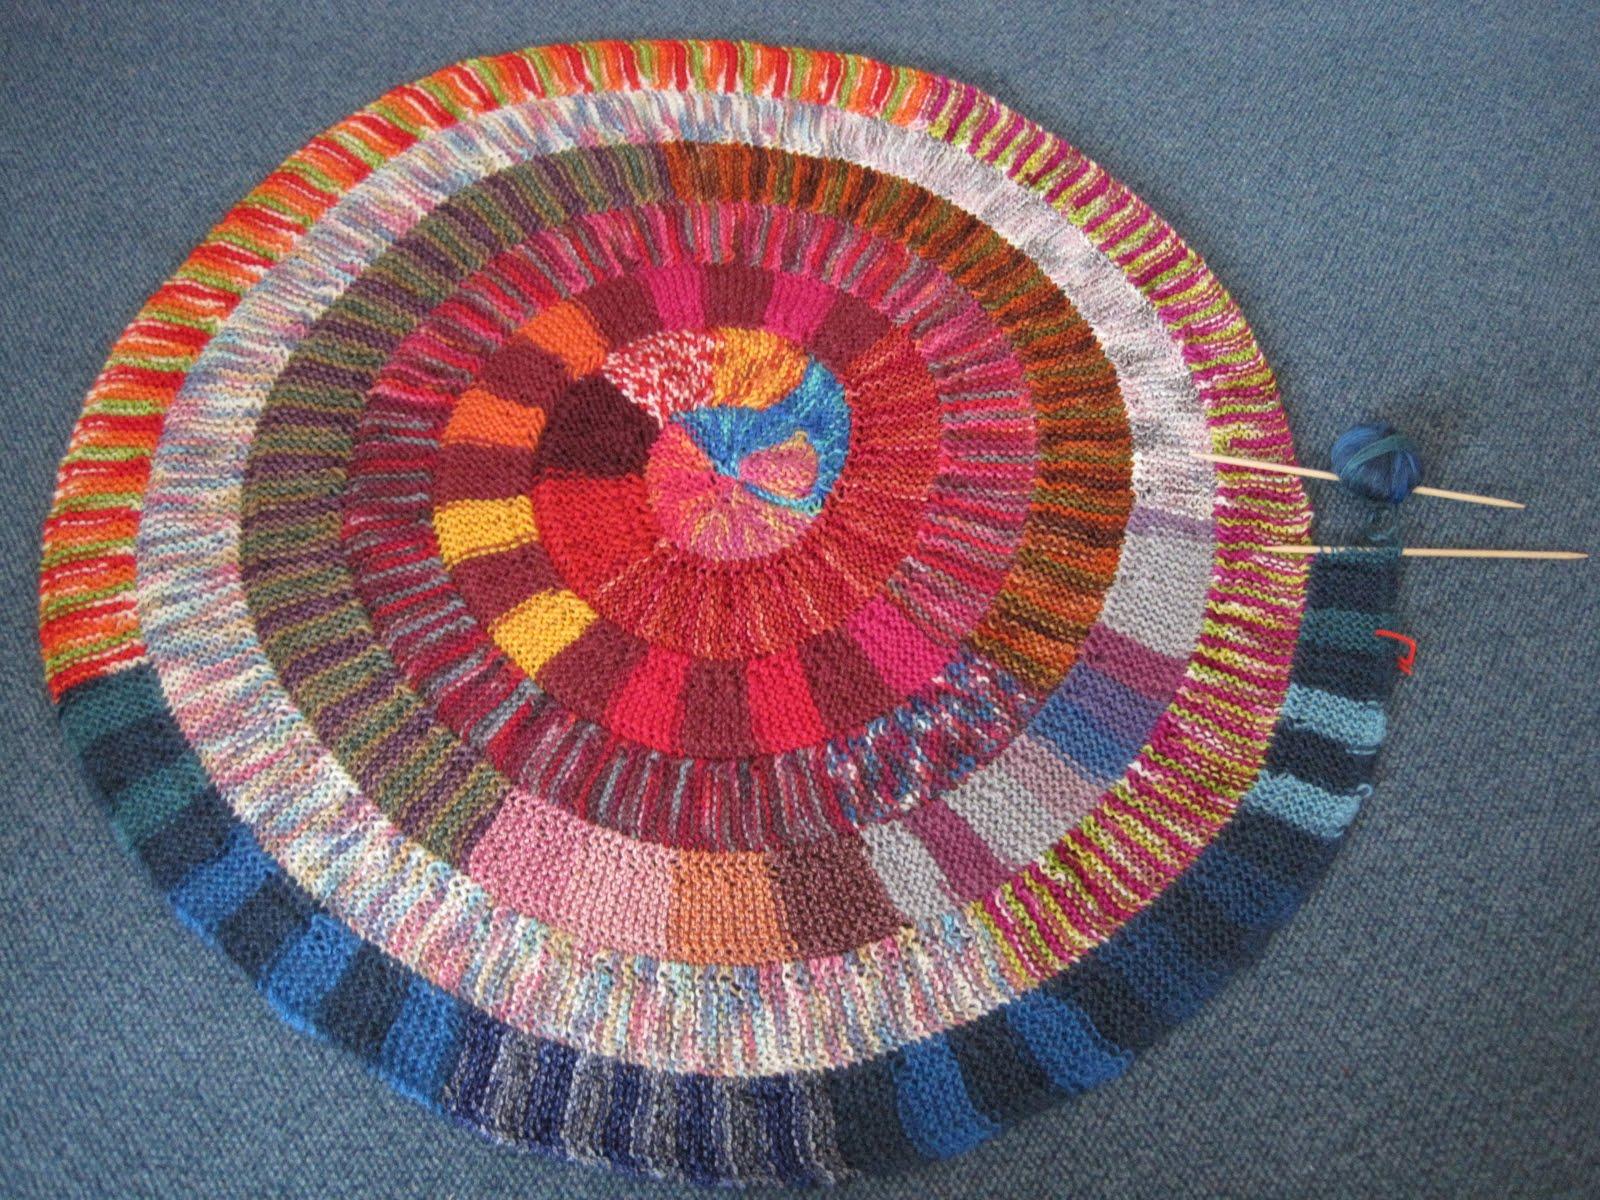 Amigurumi crochet pattern dummy charms 99p